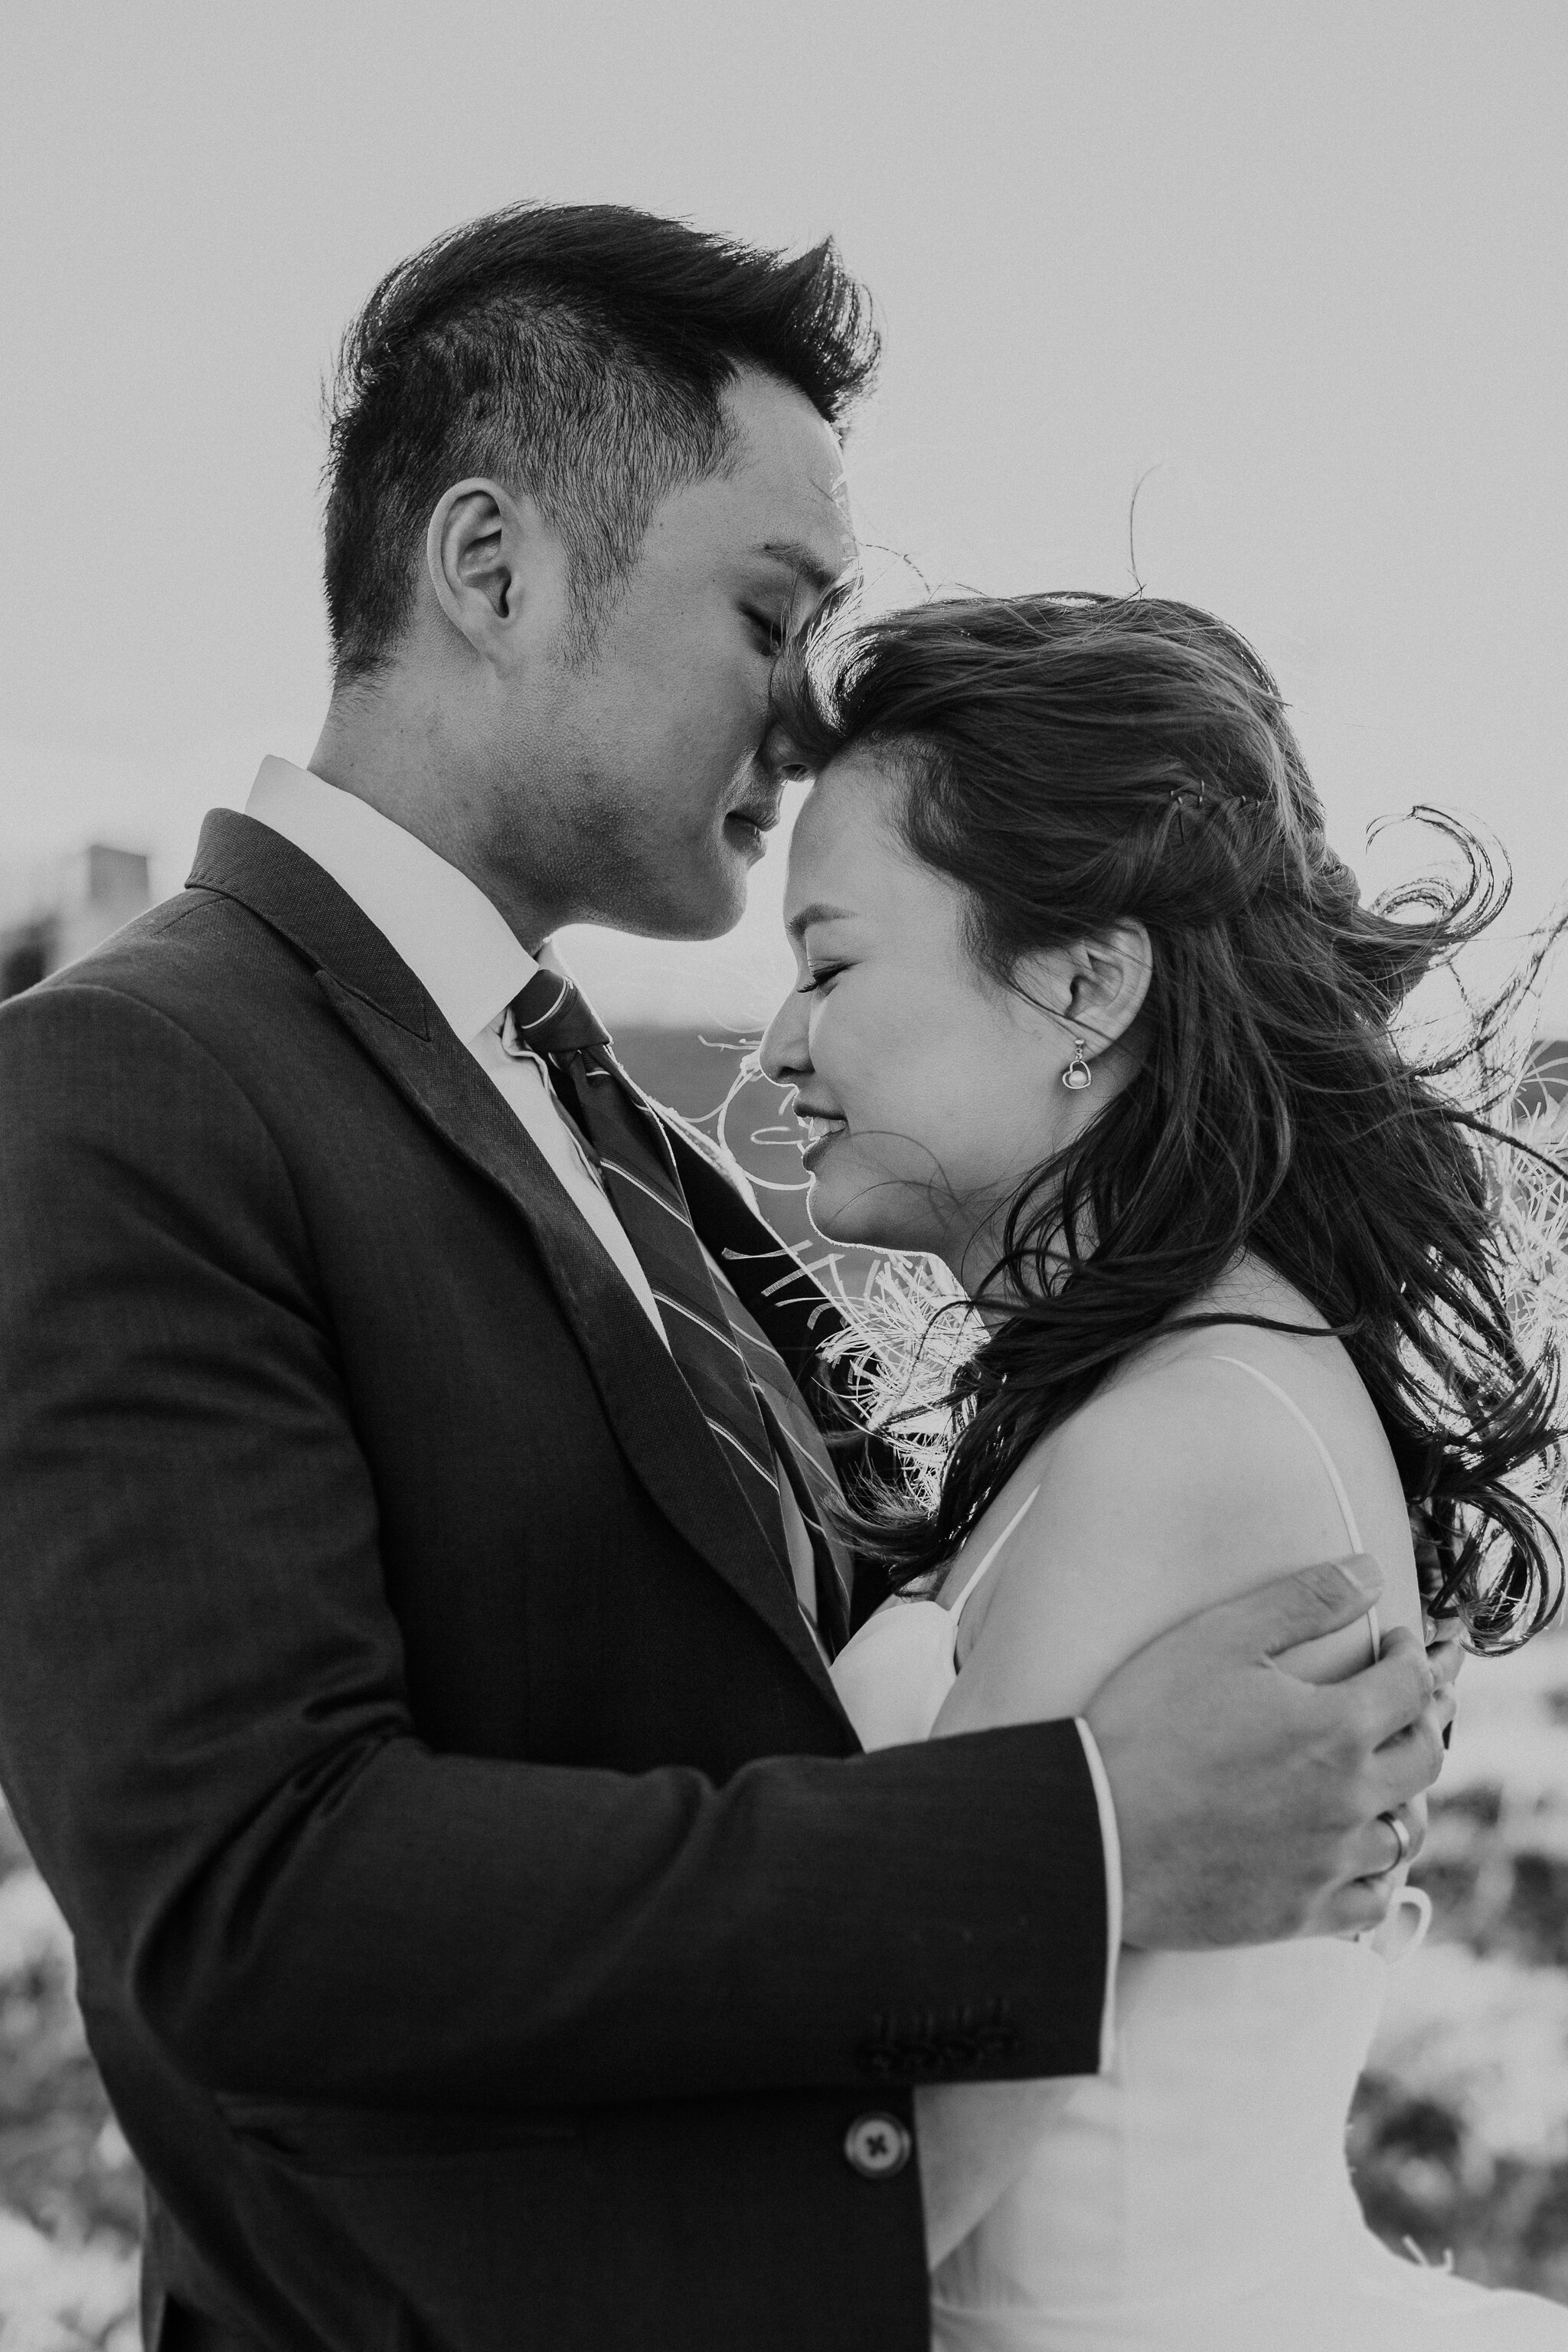 Maleny One Tree Hill Wedding - Maleny Wedding Photographer-17.jpg